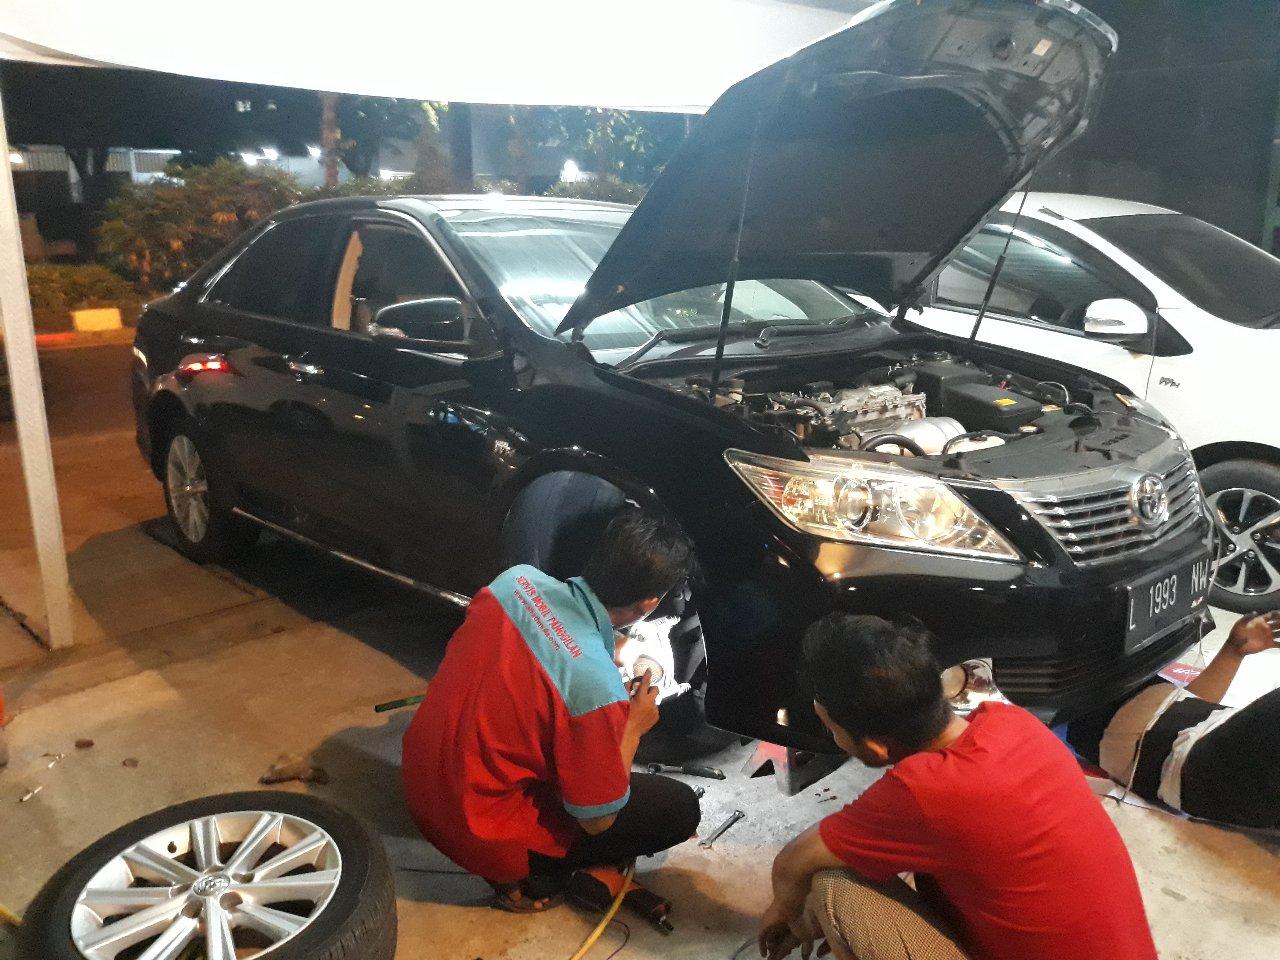 Teknisi Bengkel Mobil Hyundai 24 Jam Keputih Bengkel Mobil Dan Servis Mobil Panggilan Surabaya 08113465899